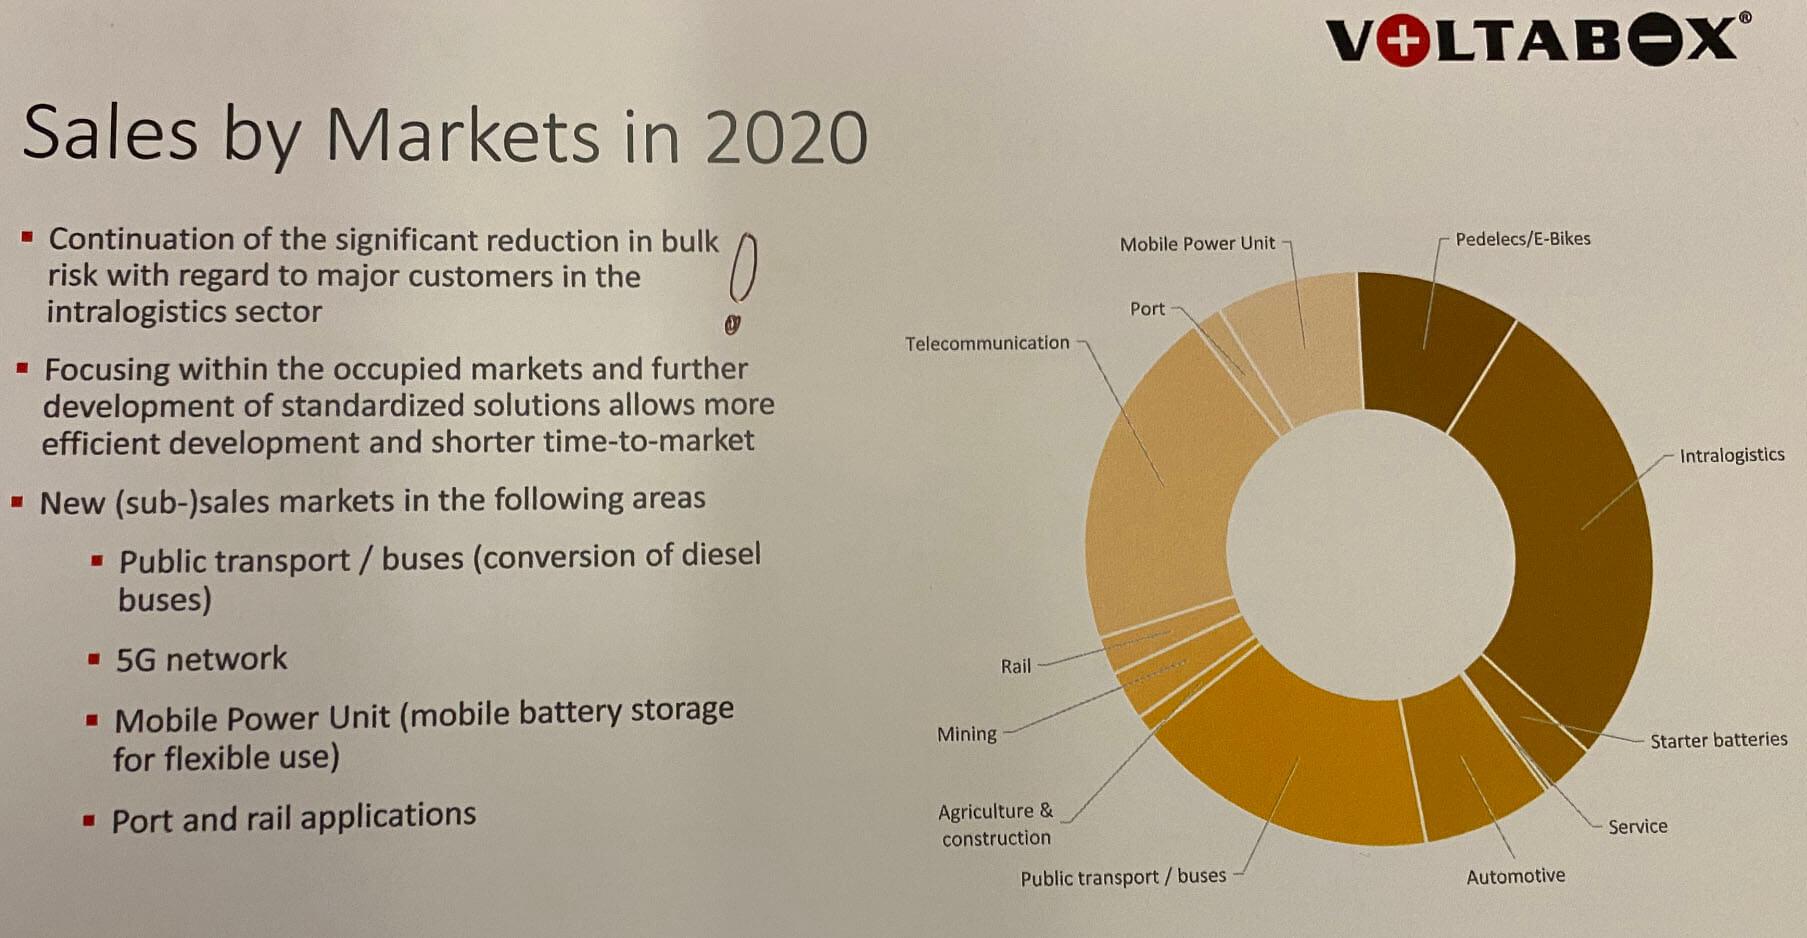 voltabox sales by markets in 2020